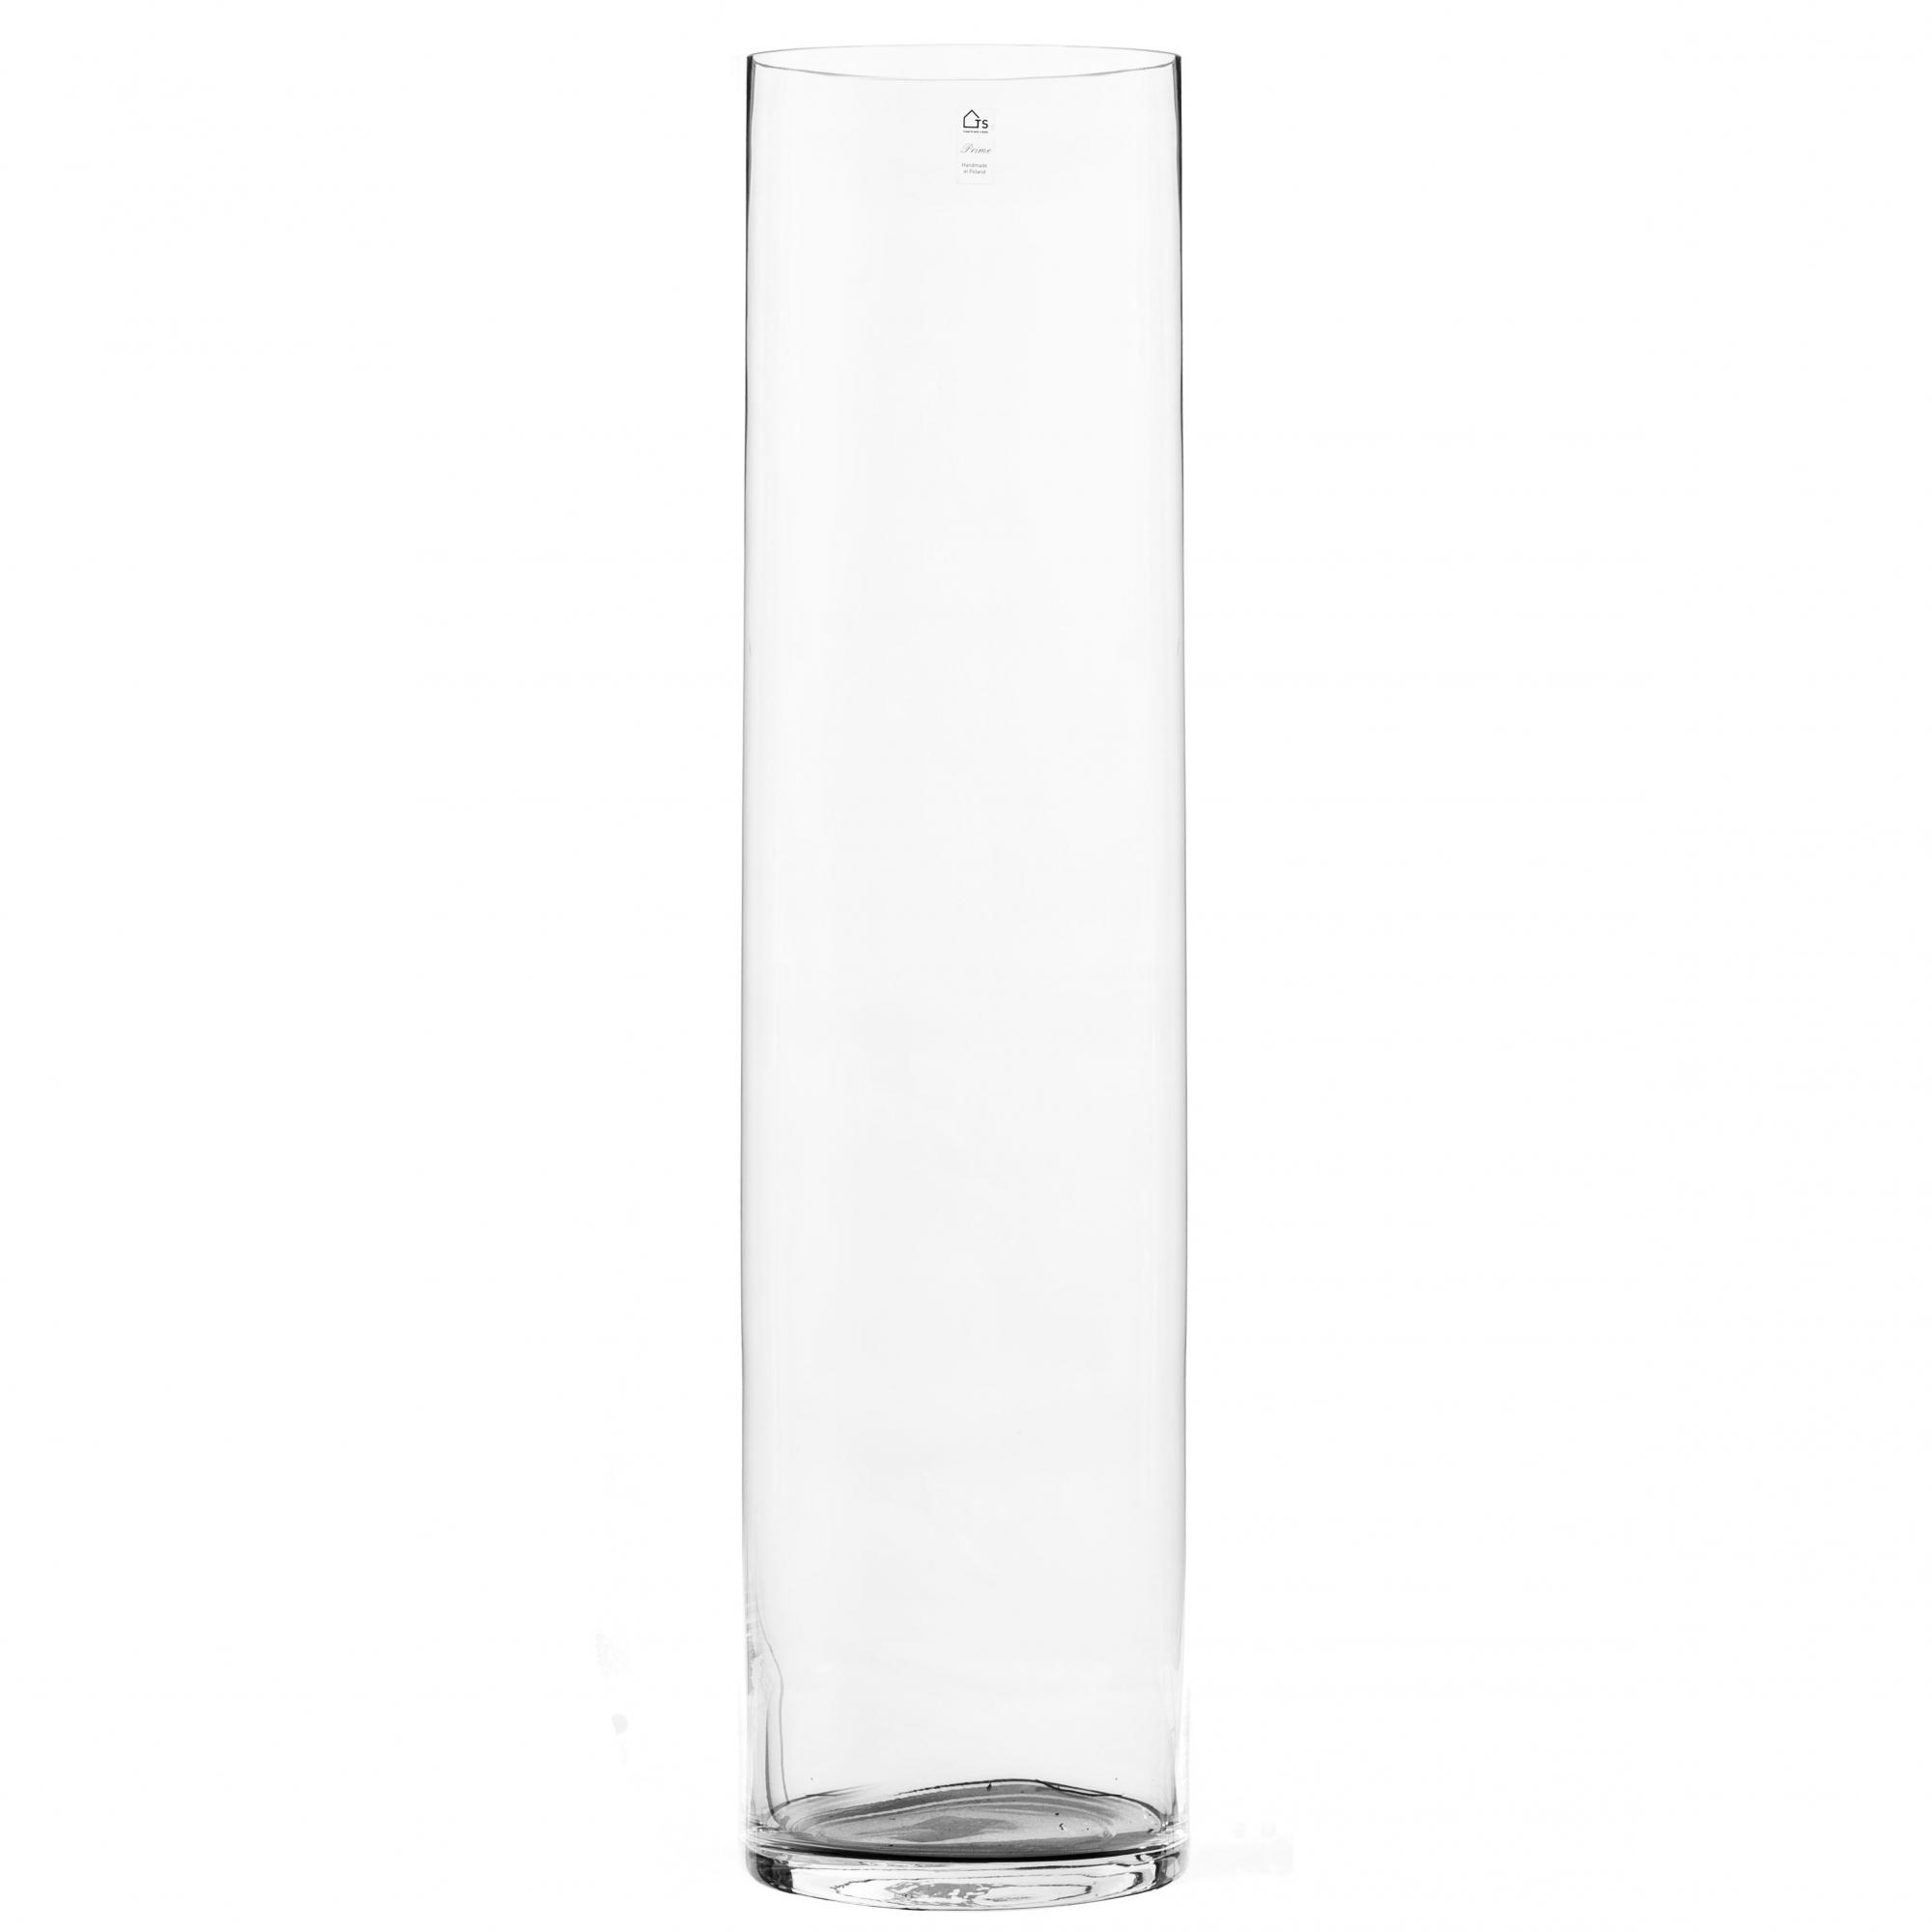 Vaso Cilindro de Vidro Artesanal Polonês 25x120cm